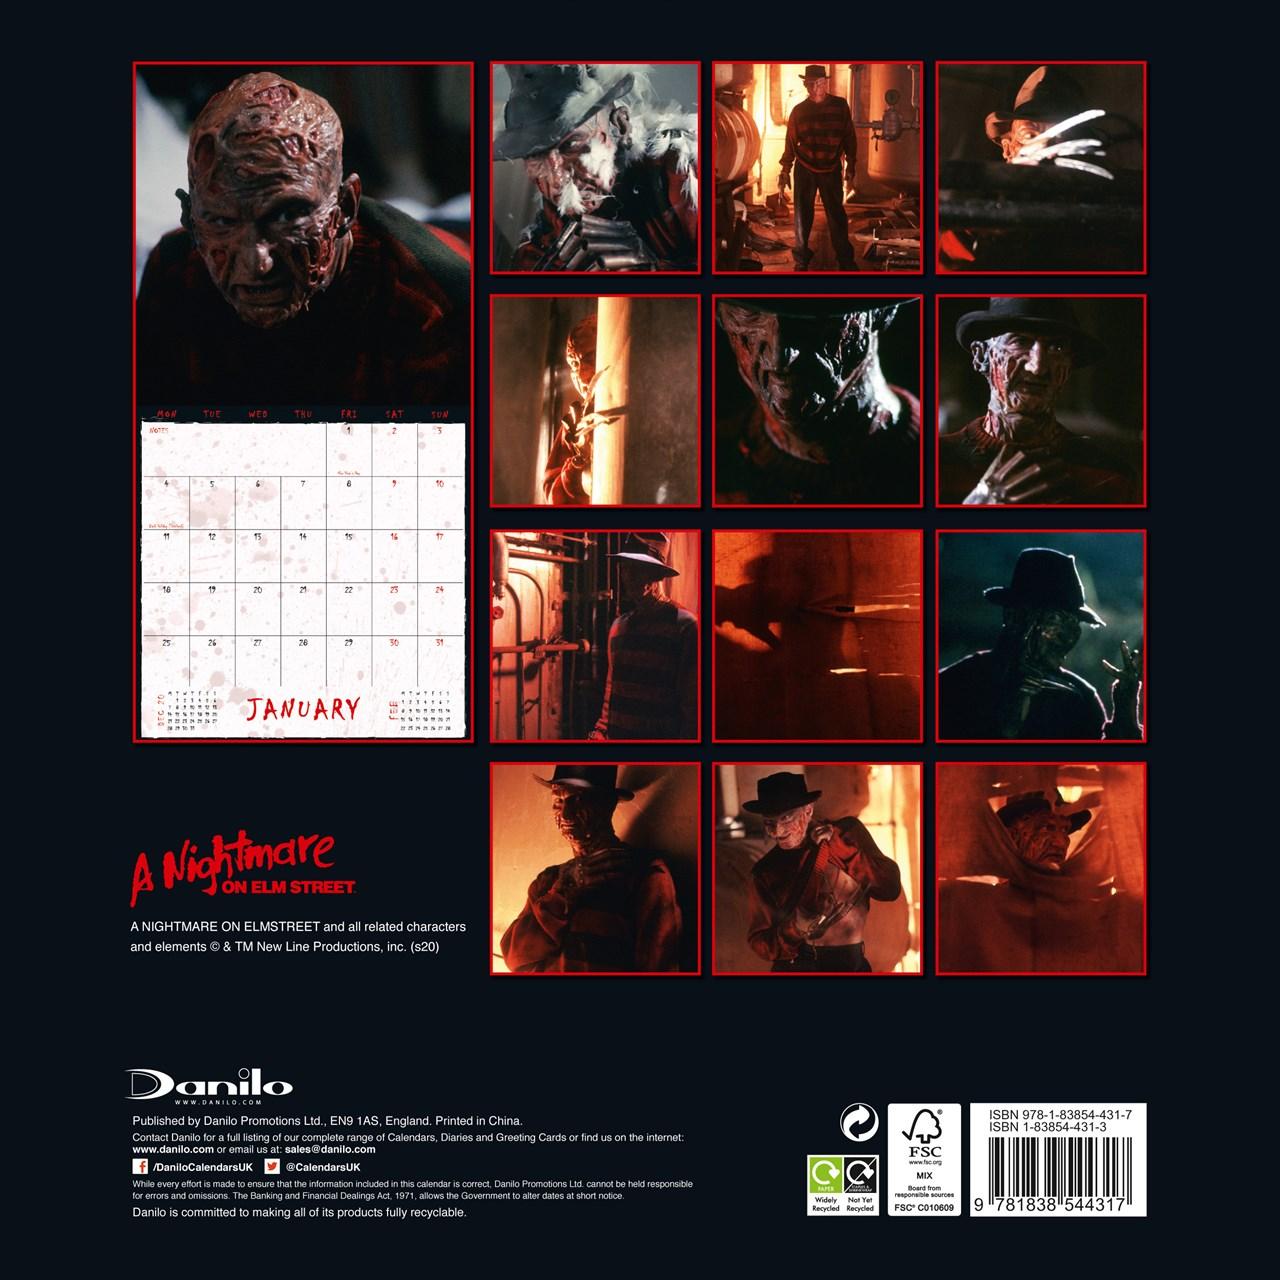 A Nightmare On Elm Street: Square 2021 Calendar - 3